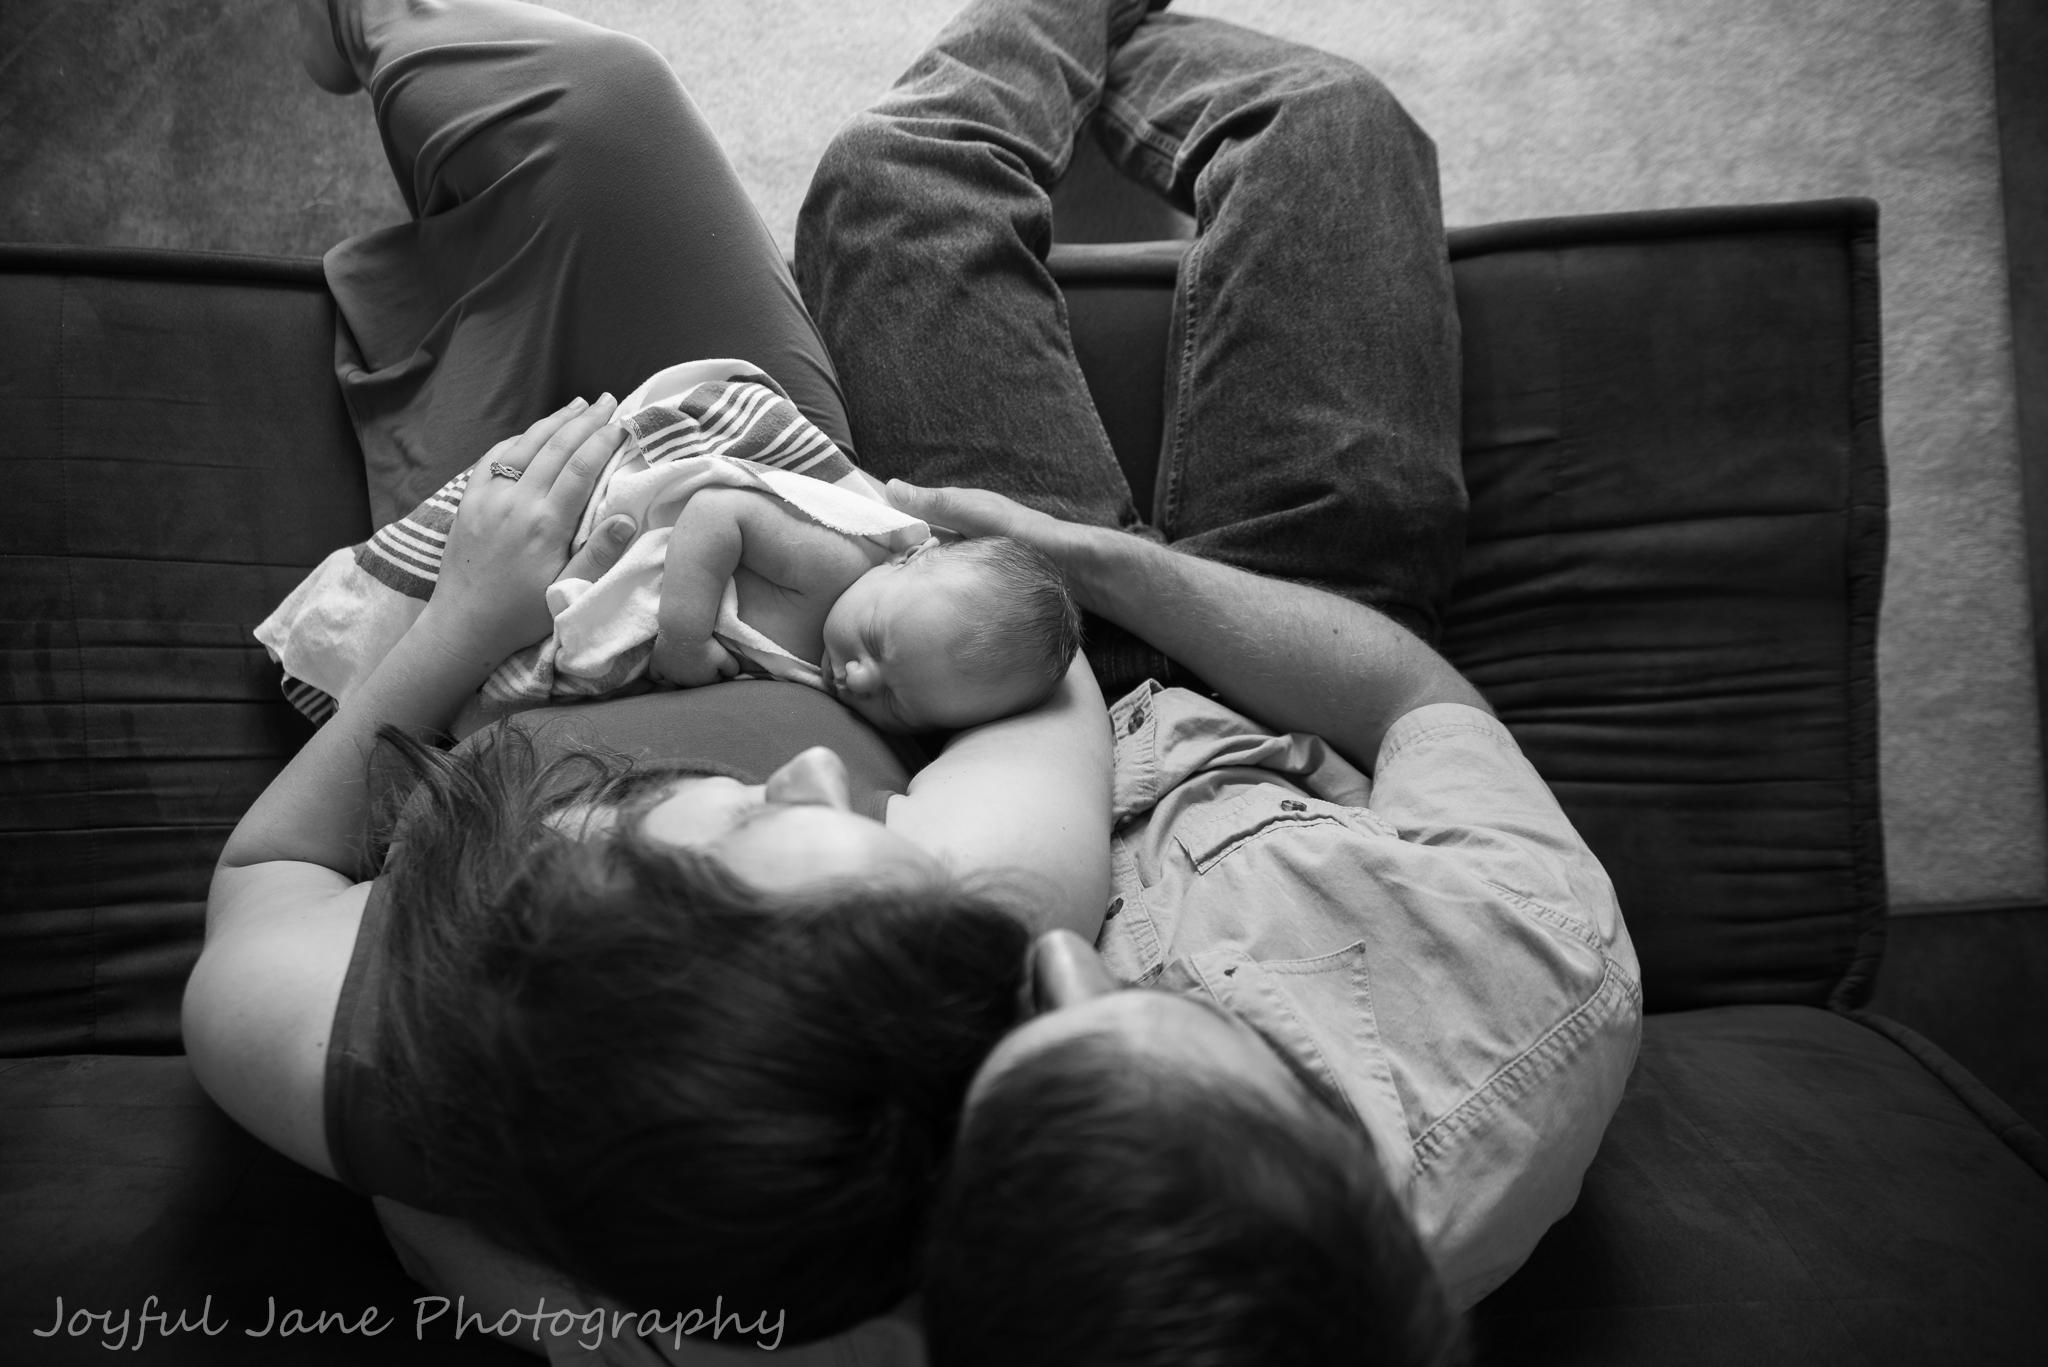 Joyful Jane Photography, In-home lifestyle newborn photography